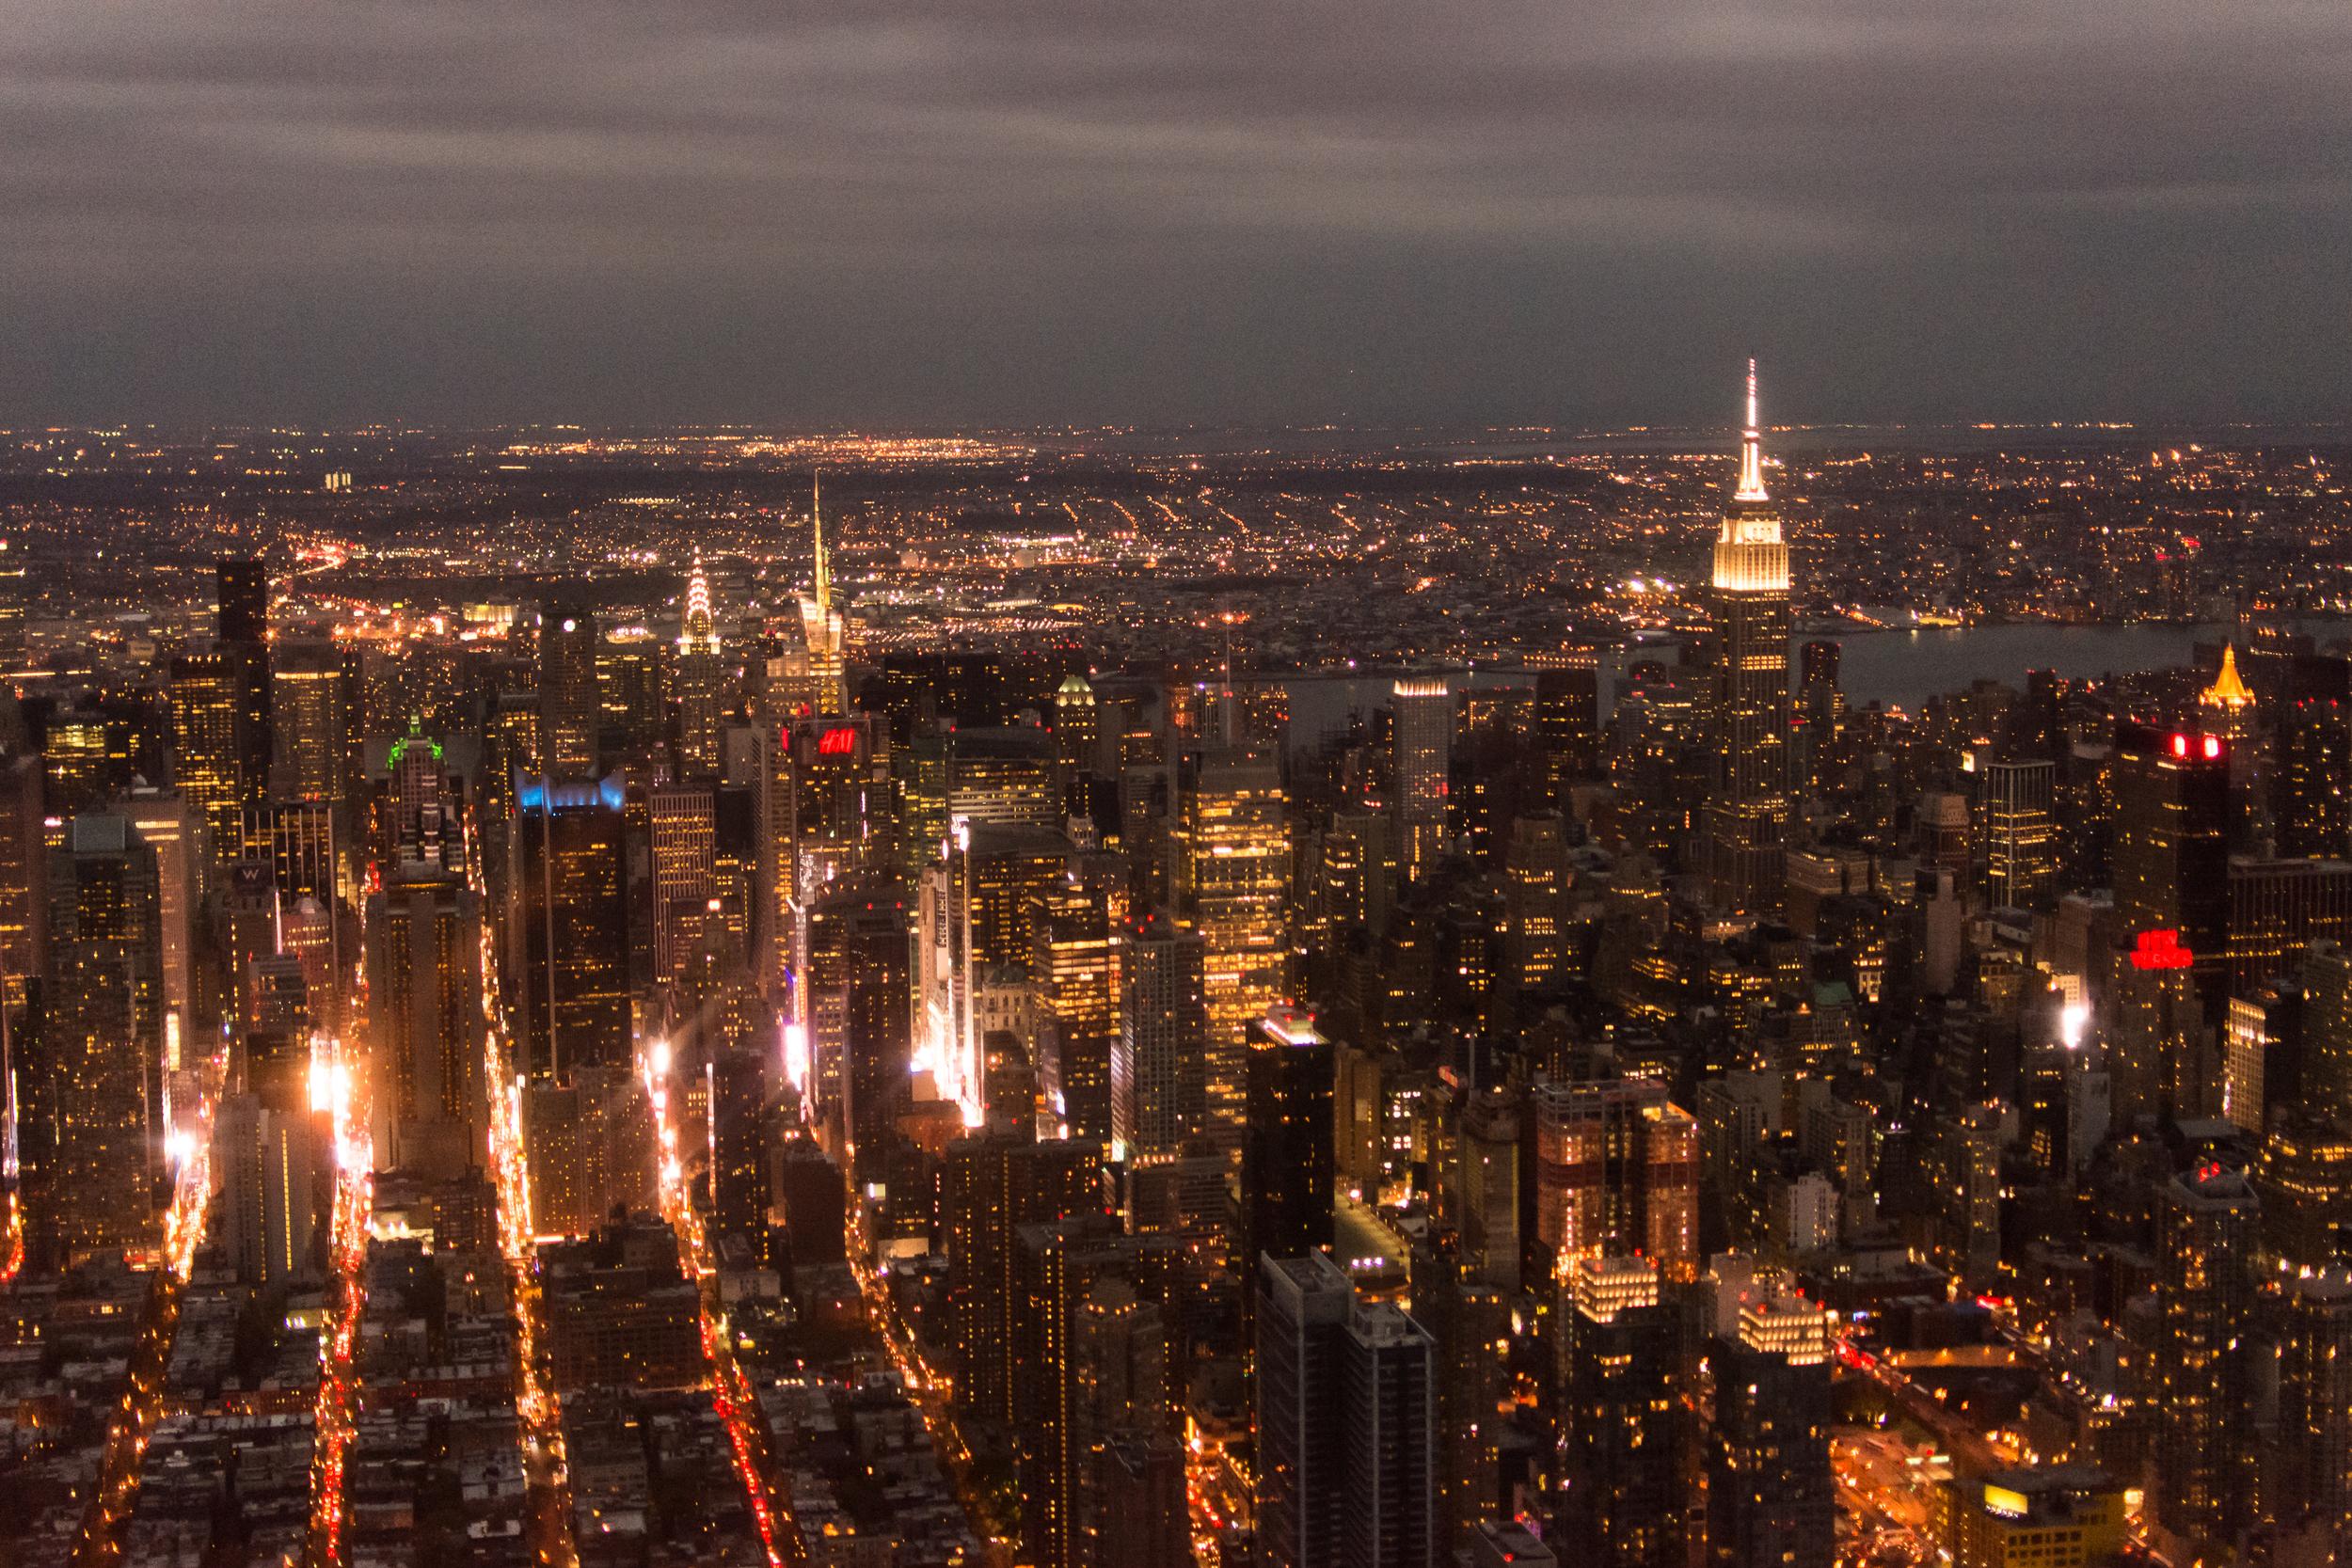 NYC_2015_023.jpg